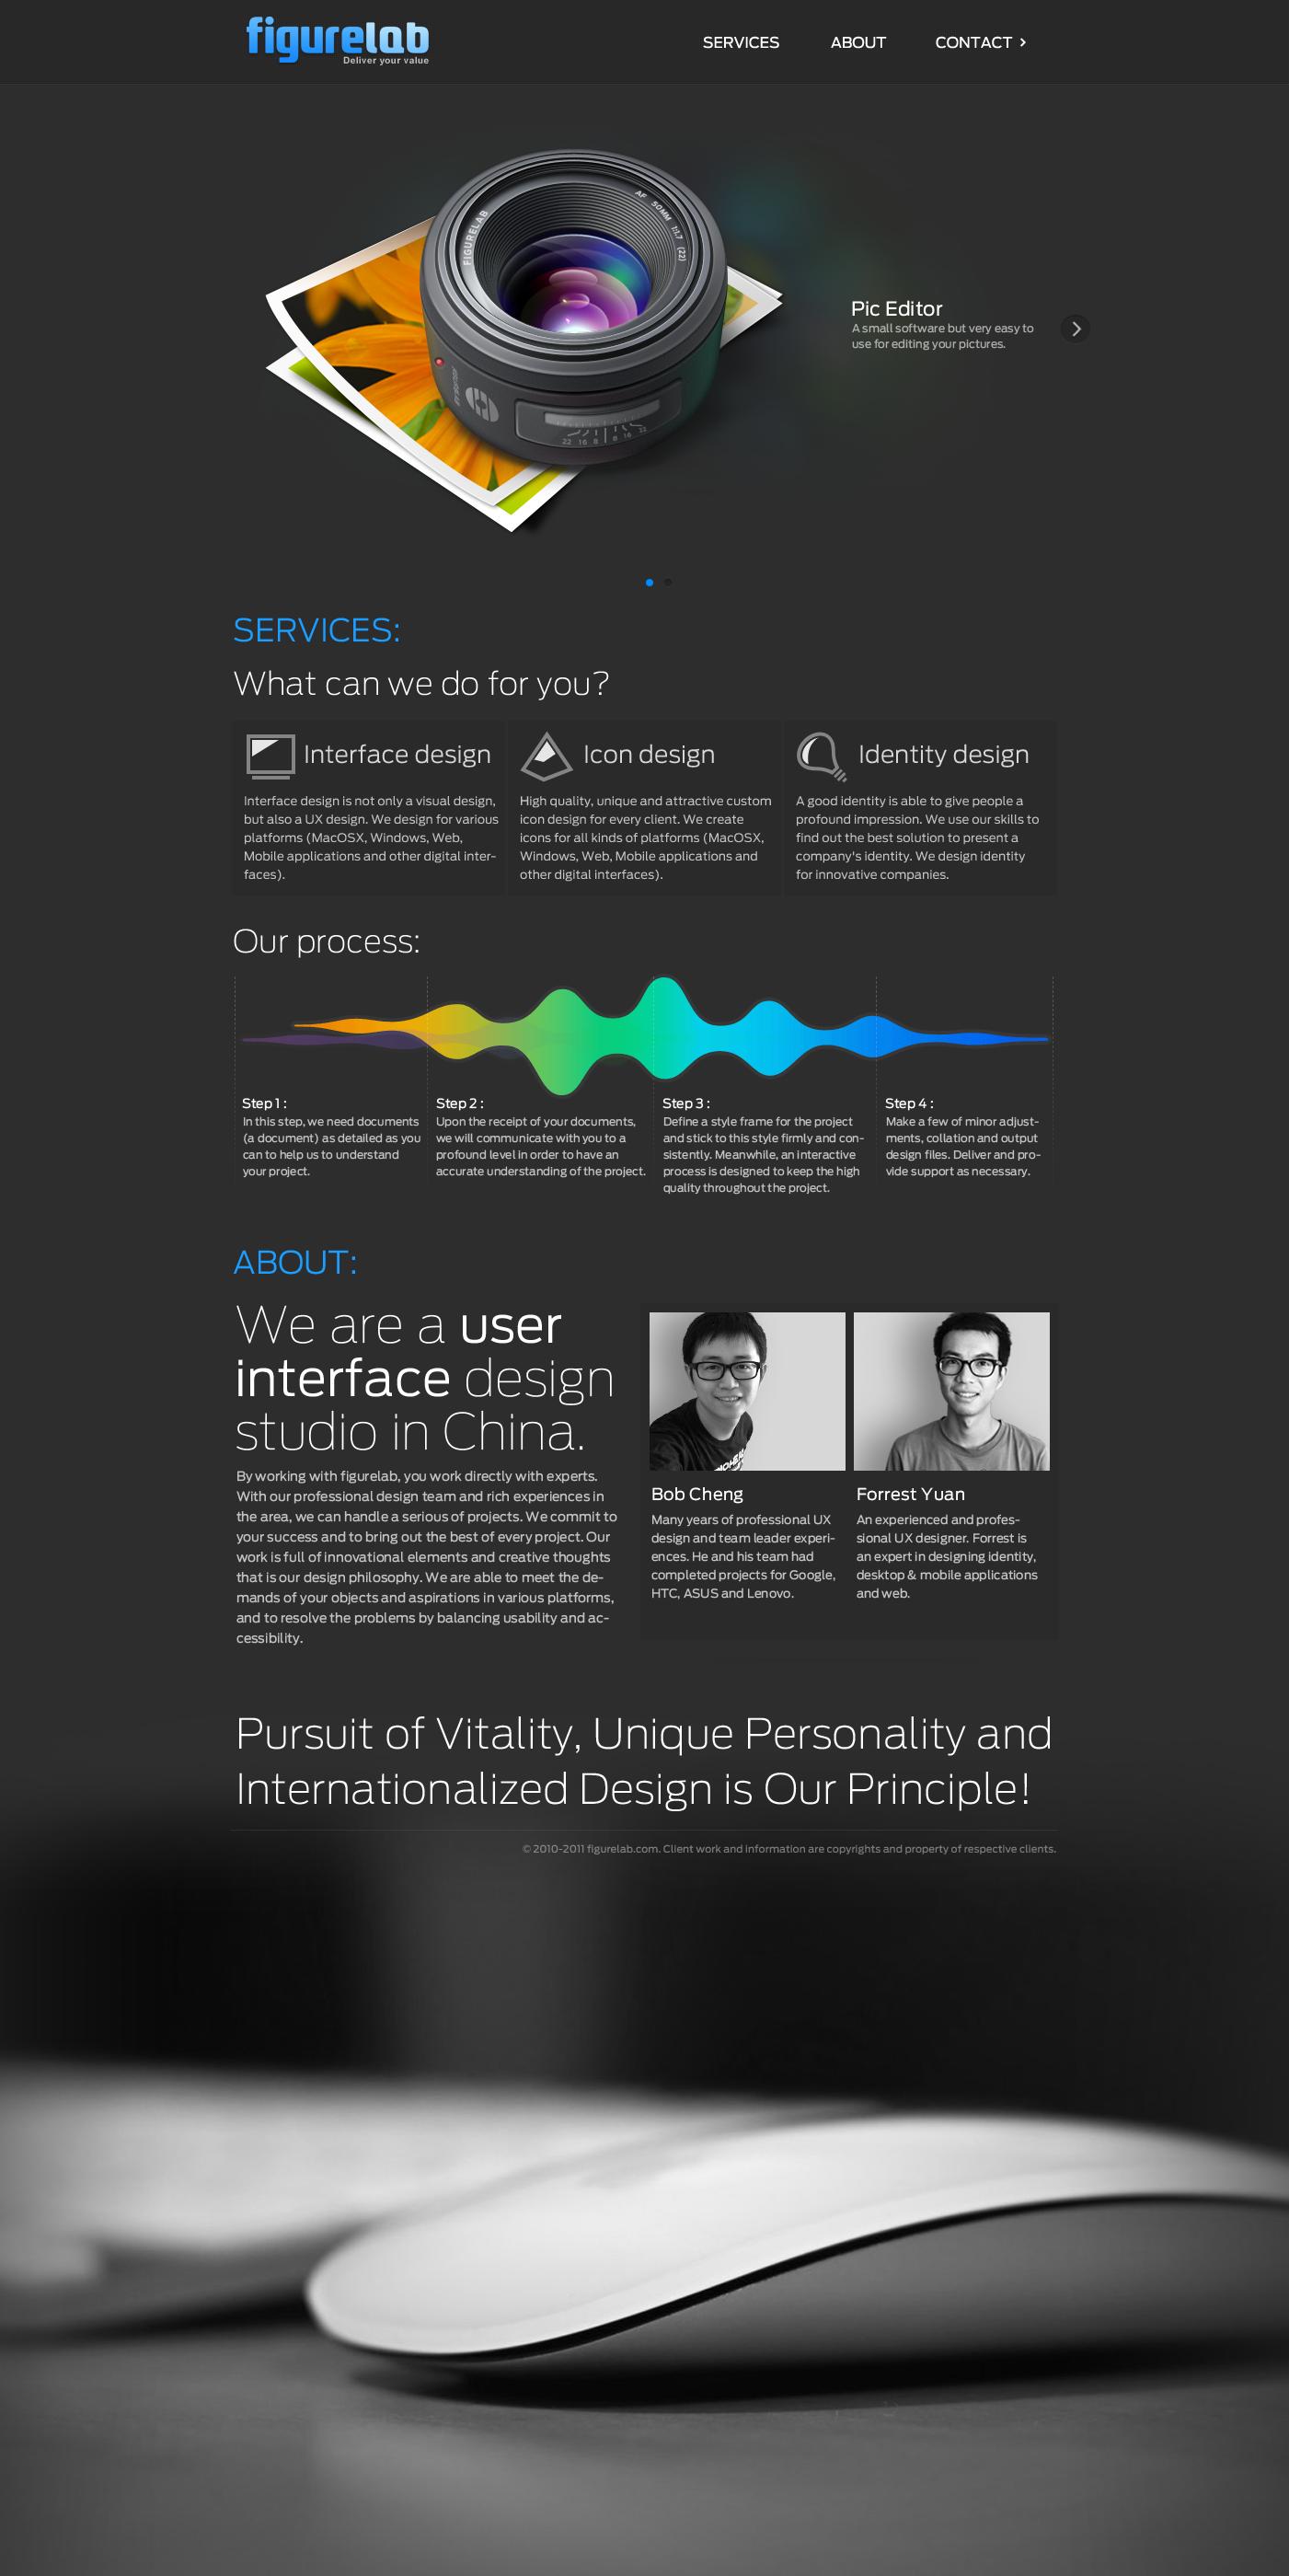 figurelab.com by ypf